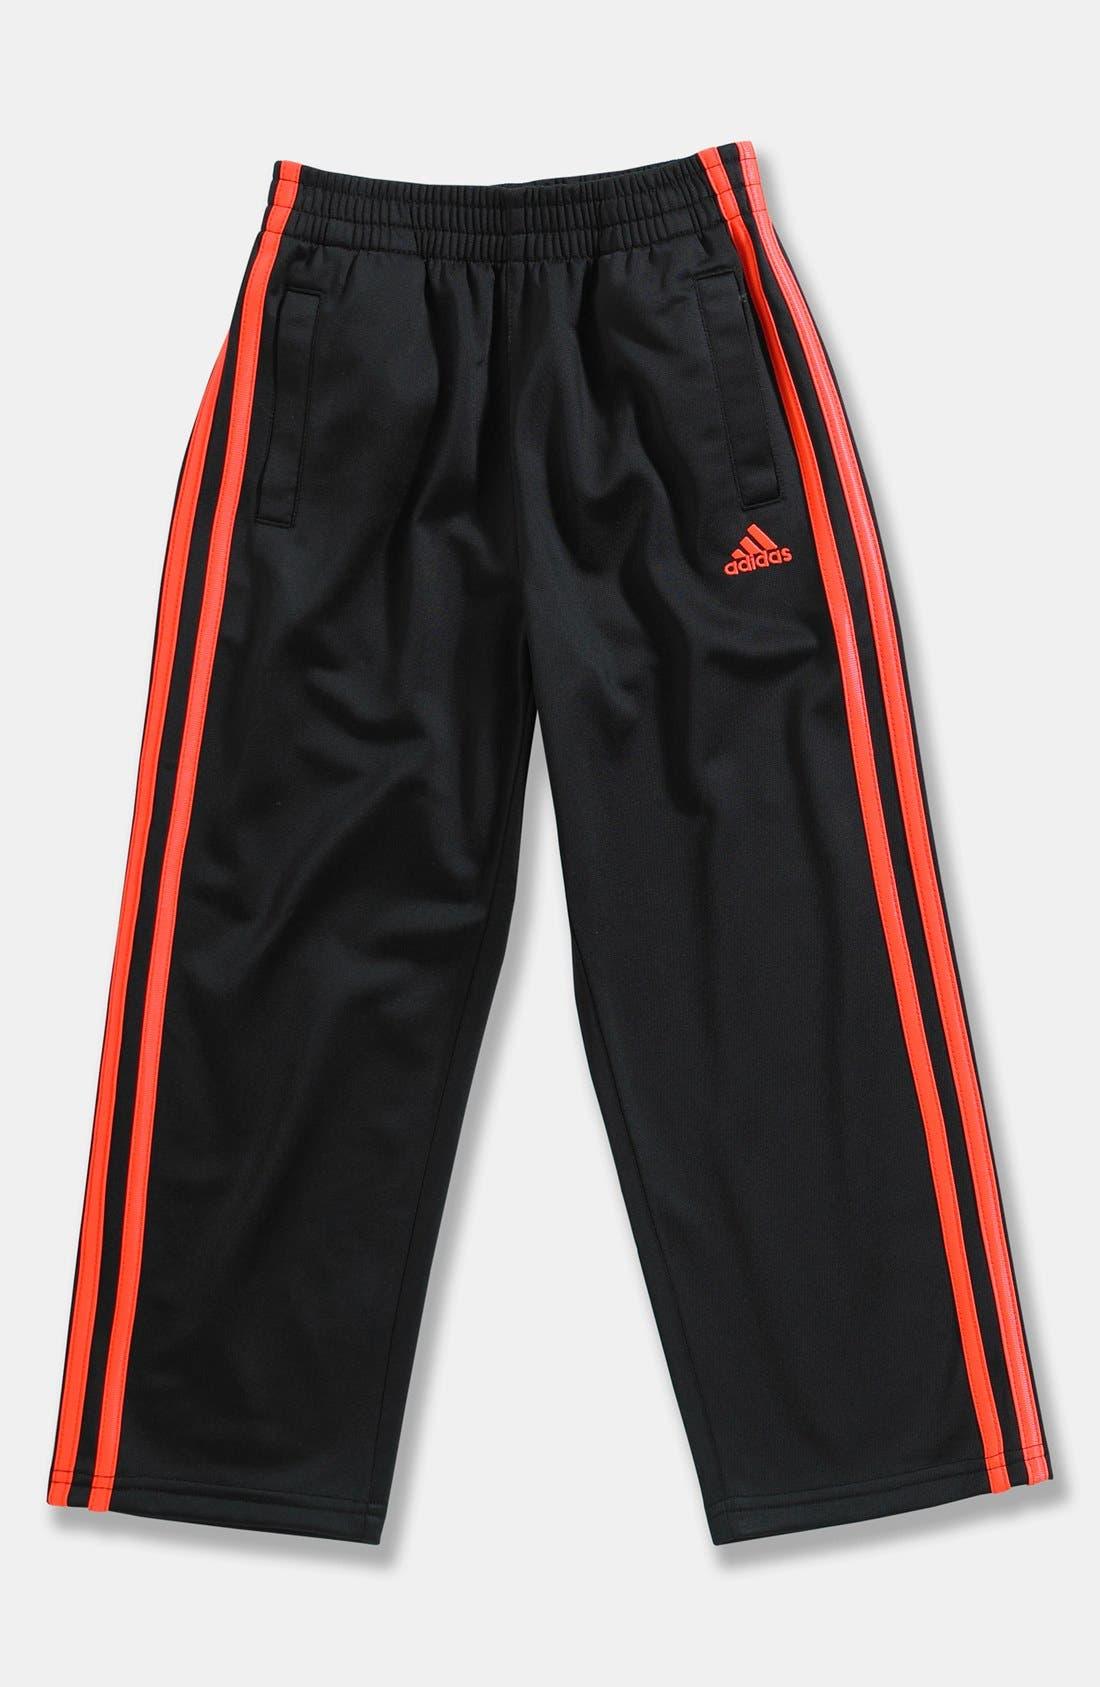 Alternate Image 1 Selected - adidas 'Impact' Pants (Little Boys)